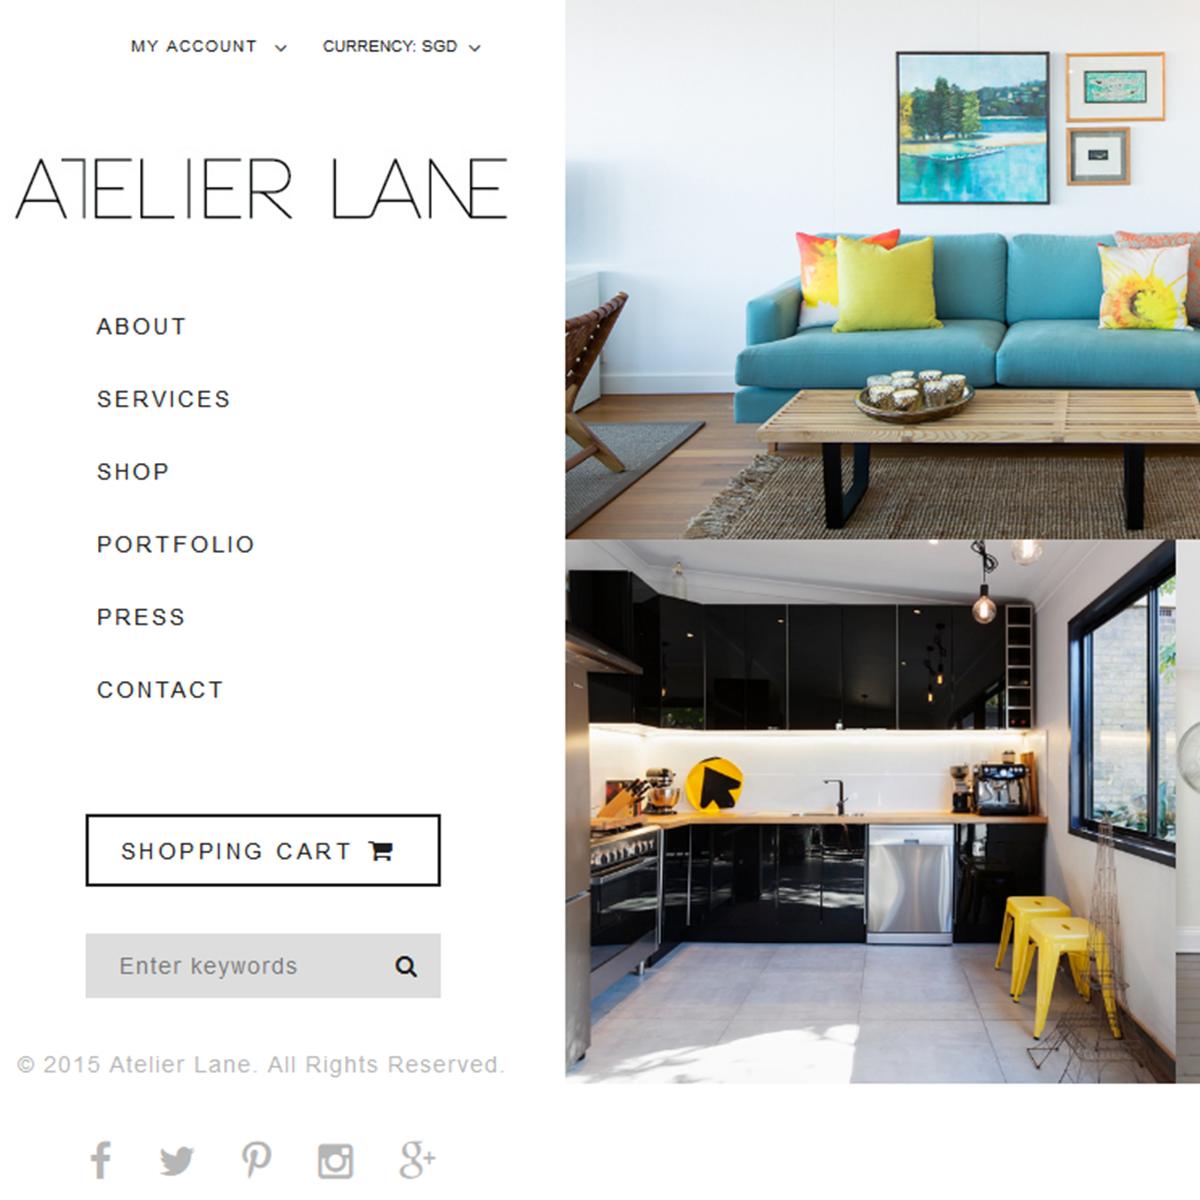 Atelier Lane